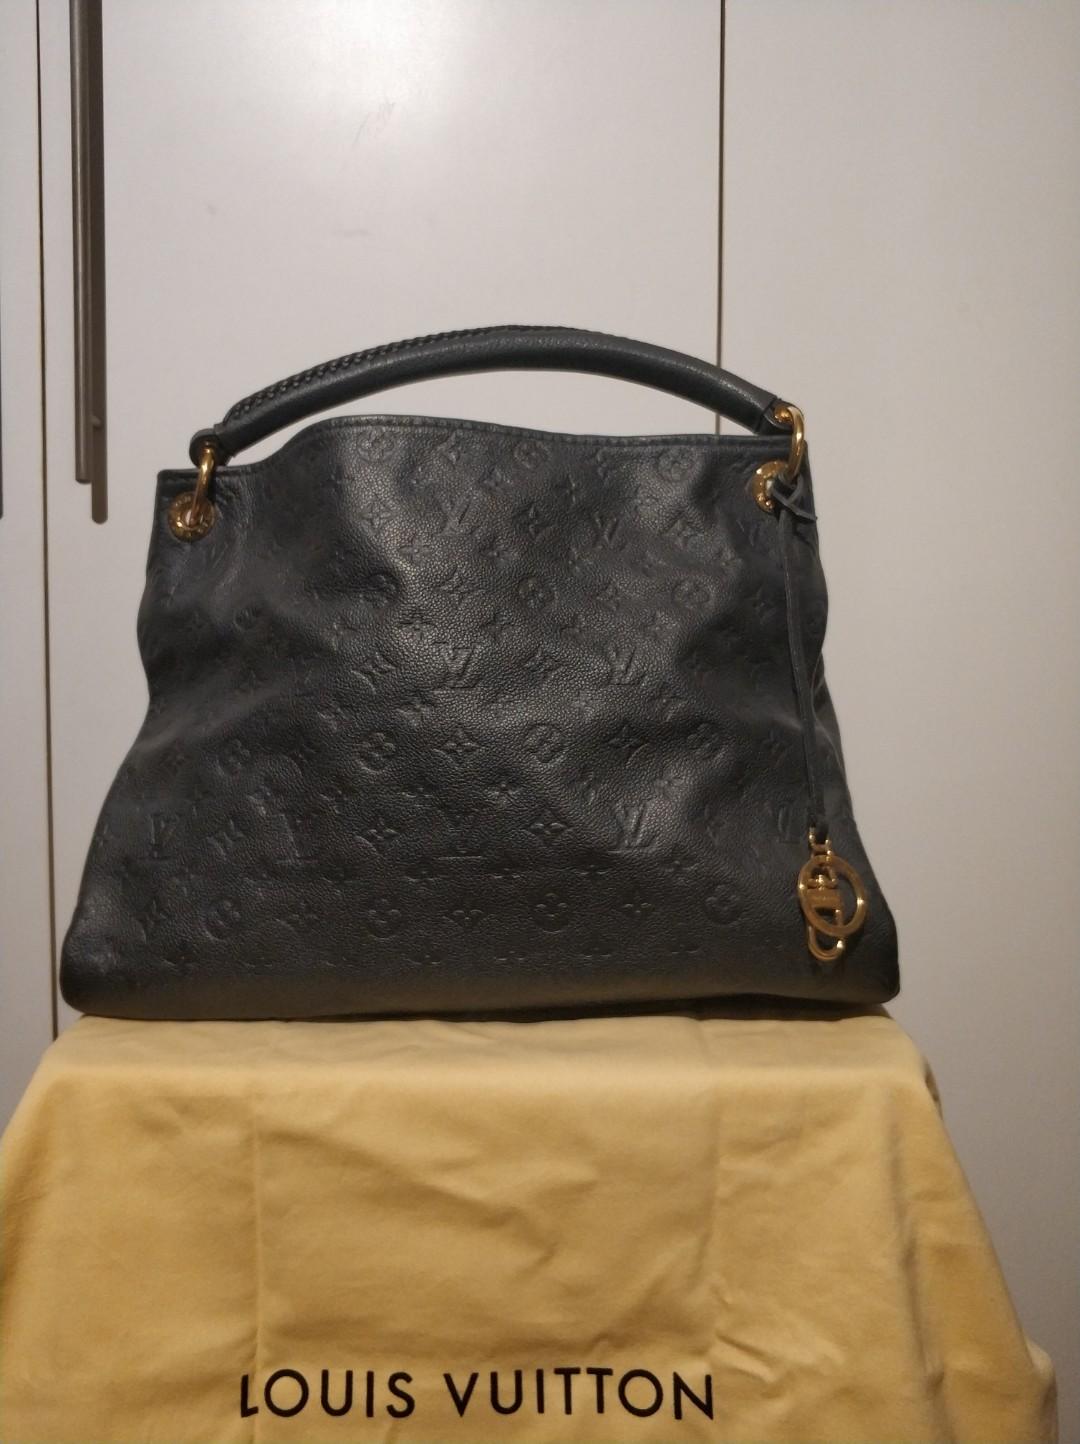 Louis Vuitton Artsy MM Empreinte Monogram Bleu Infini  LV  luxury ... f018eef407d